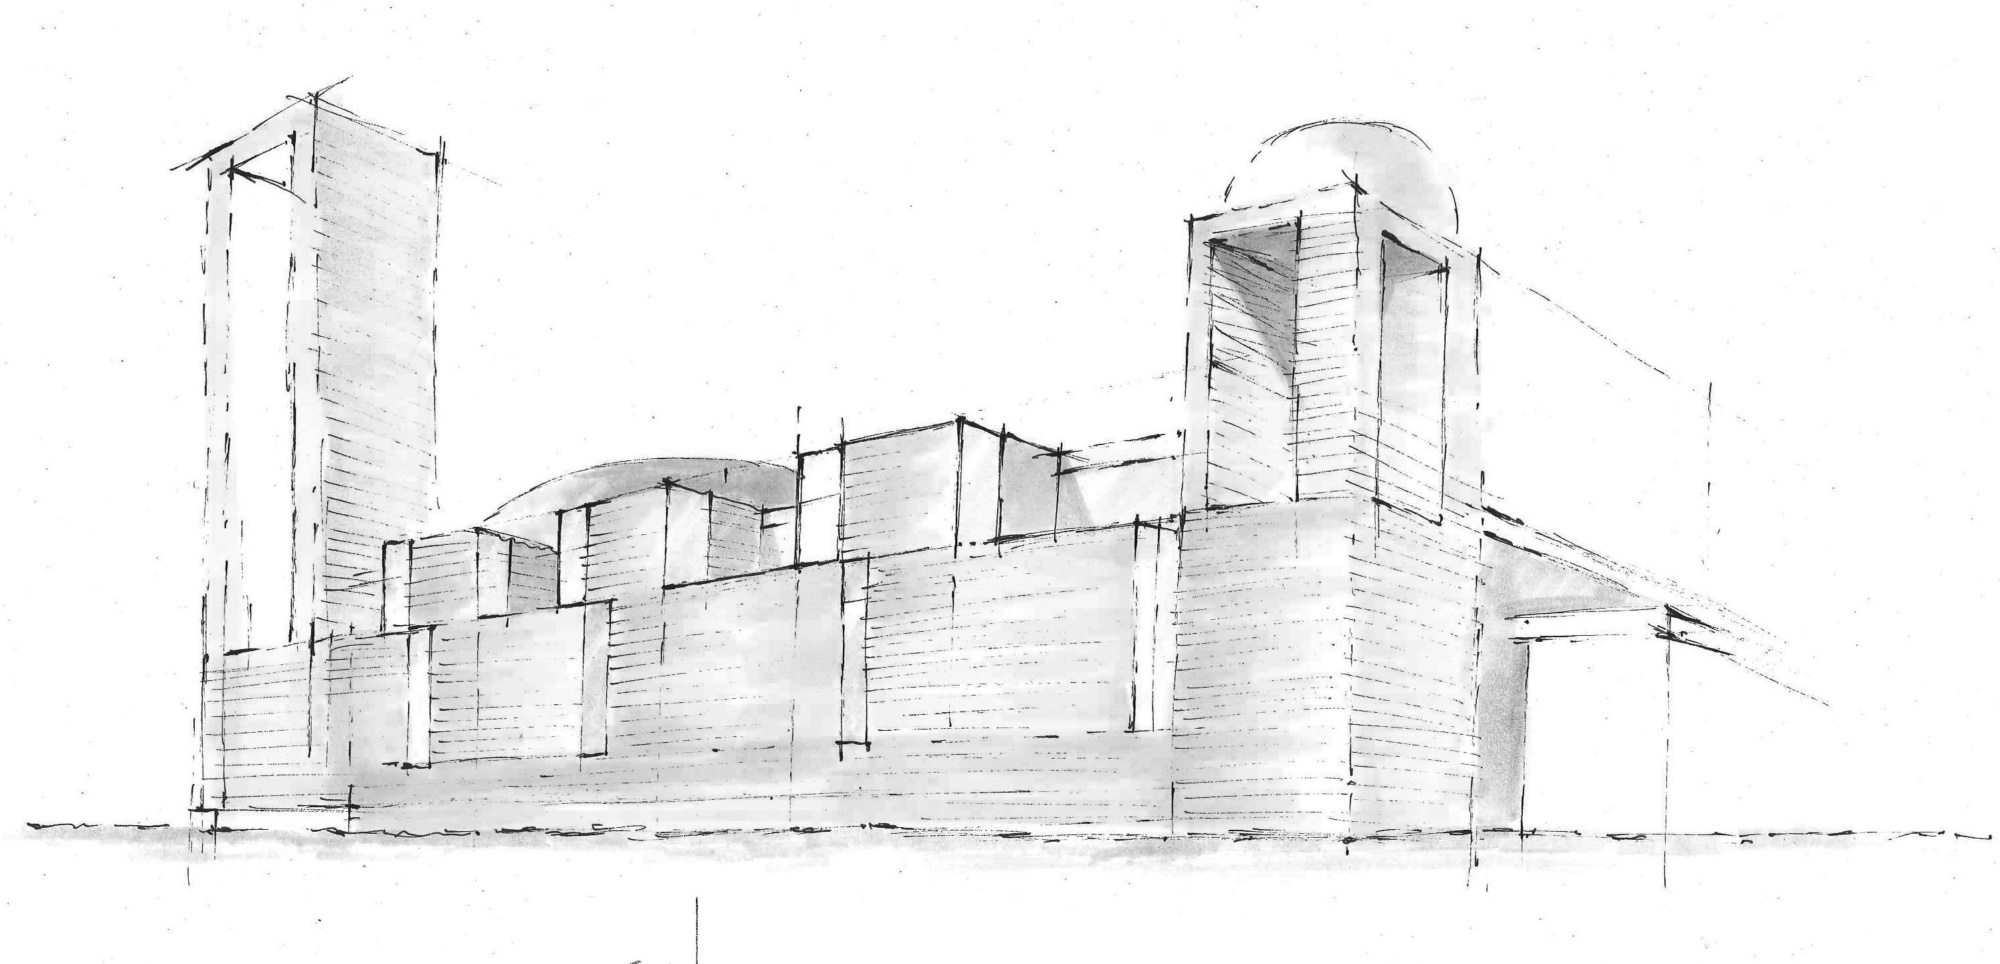 kulturzentrum leopoldau